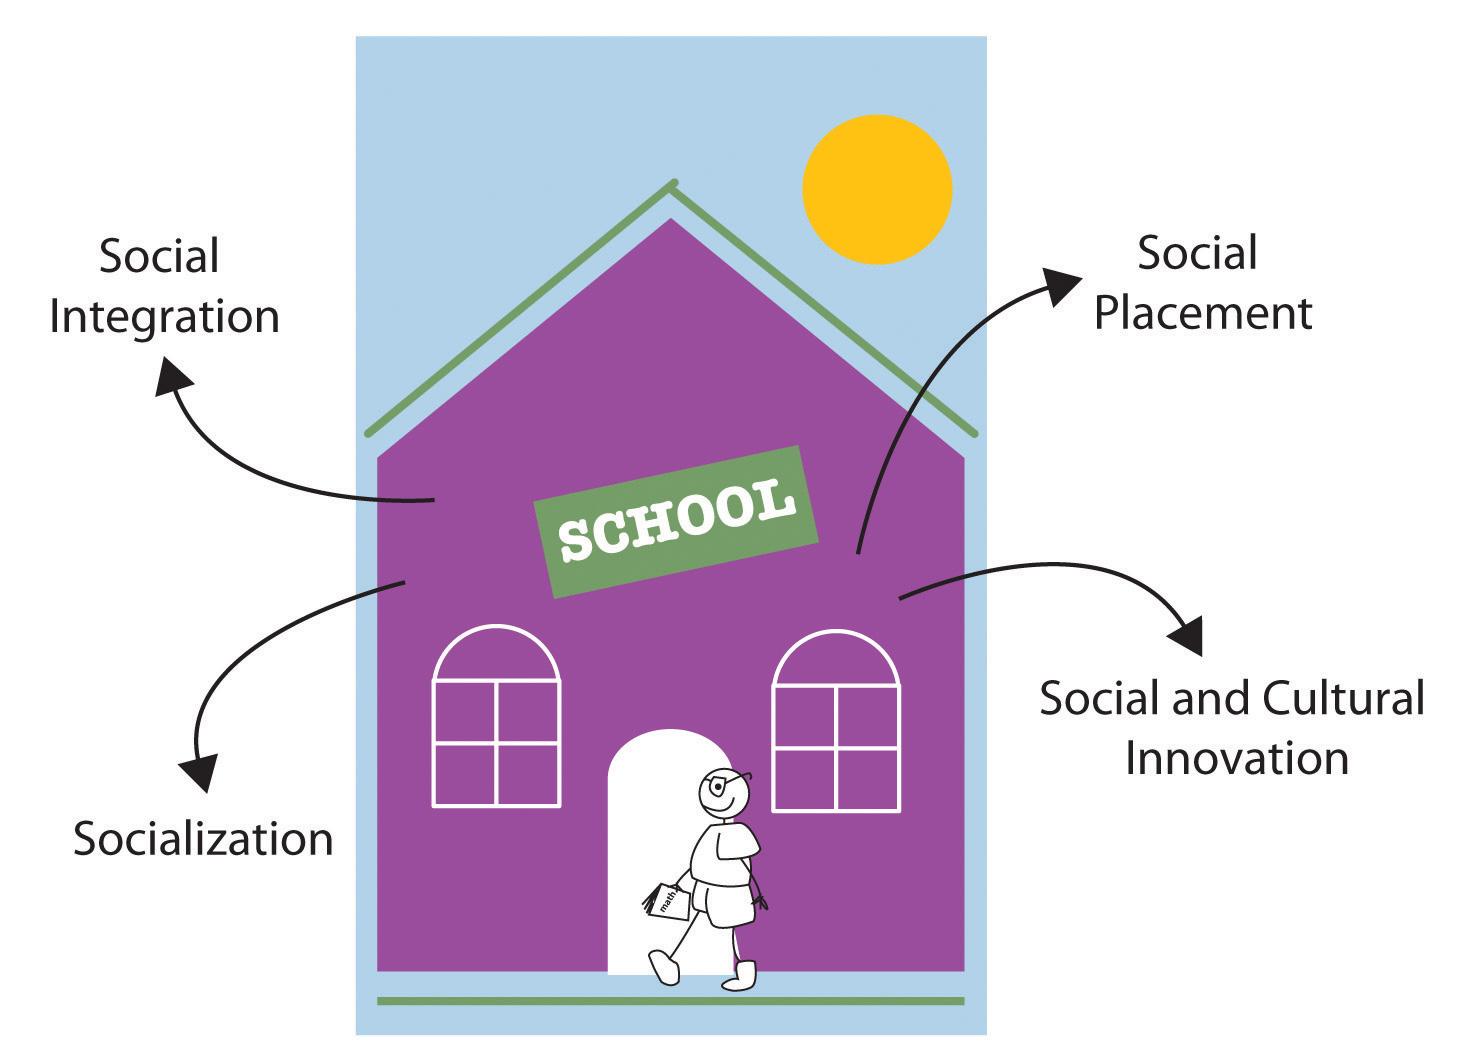 The Functions of Education: social integration, social placement, socialization, social and cultural innovation